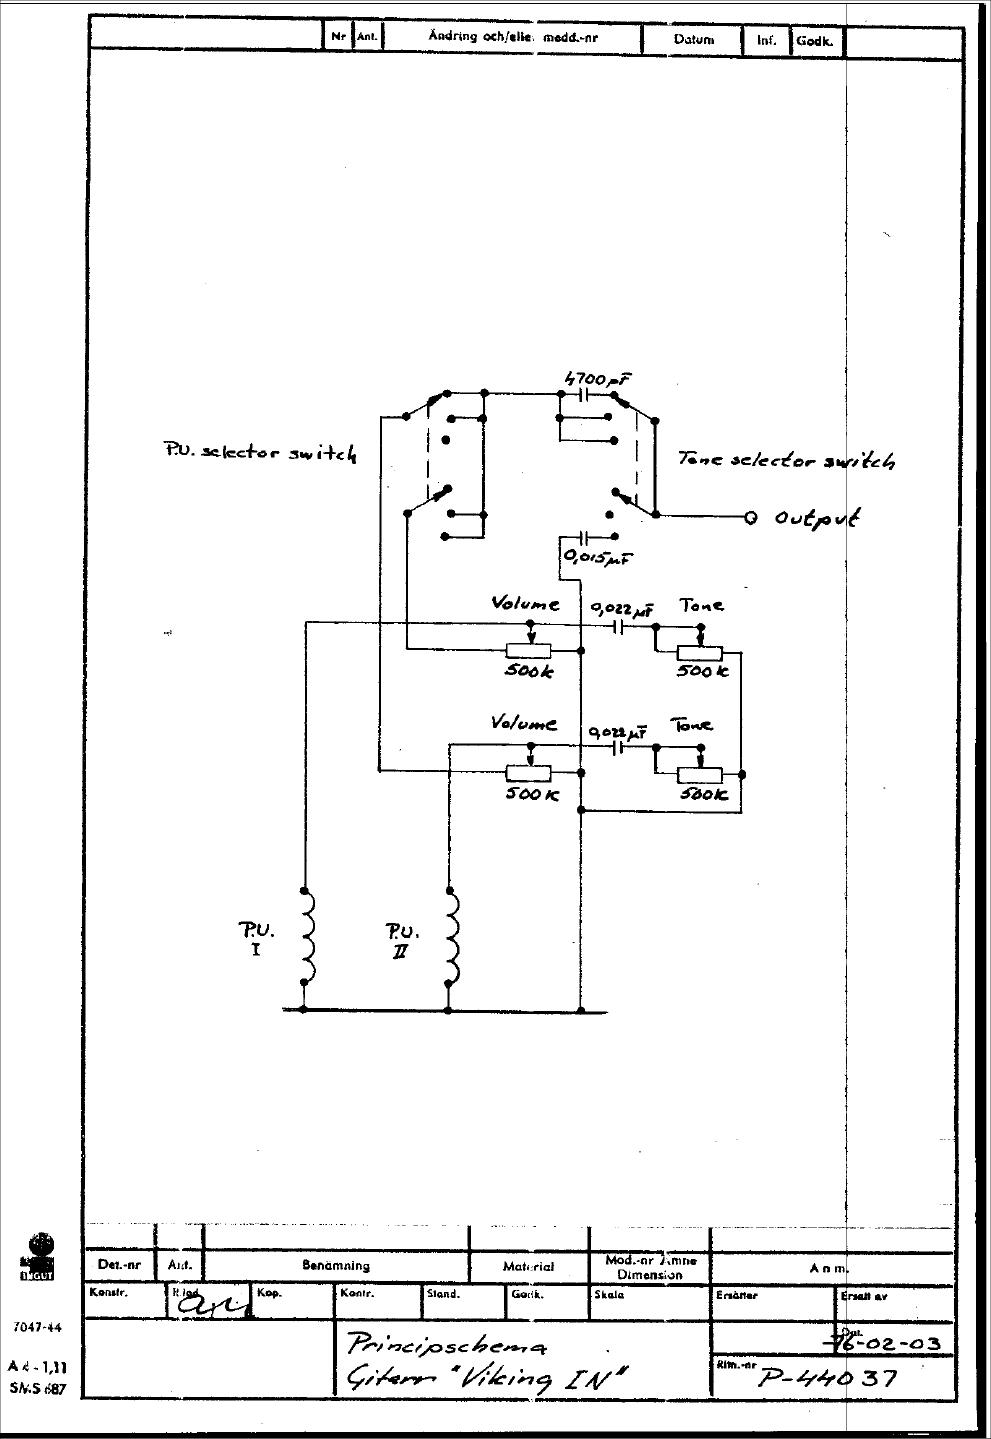 schemat /Przystawki2/Hagstrom Viking1N-1976.jpg